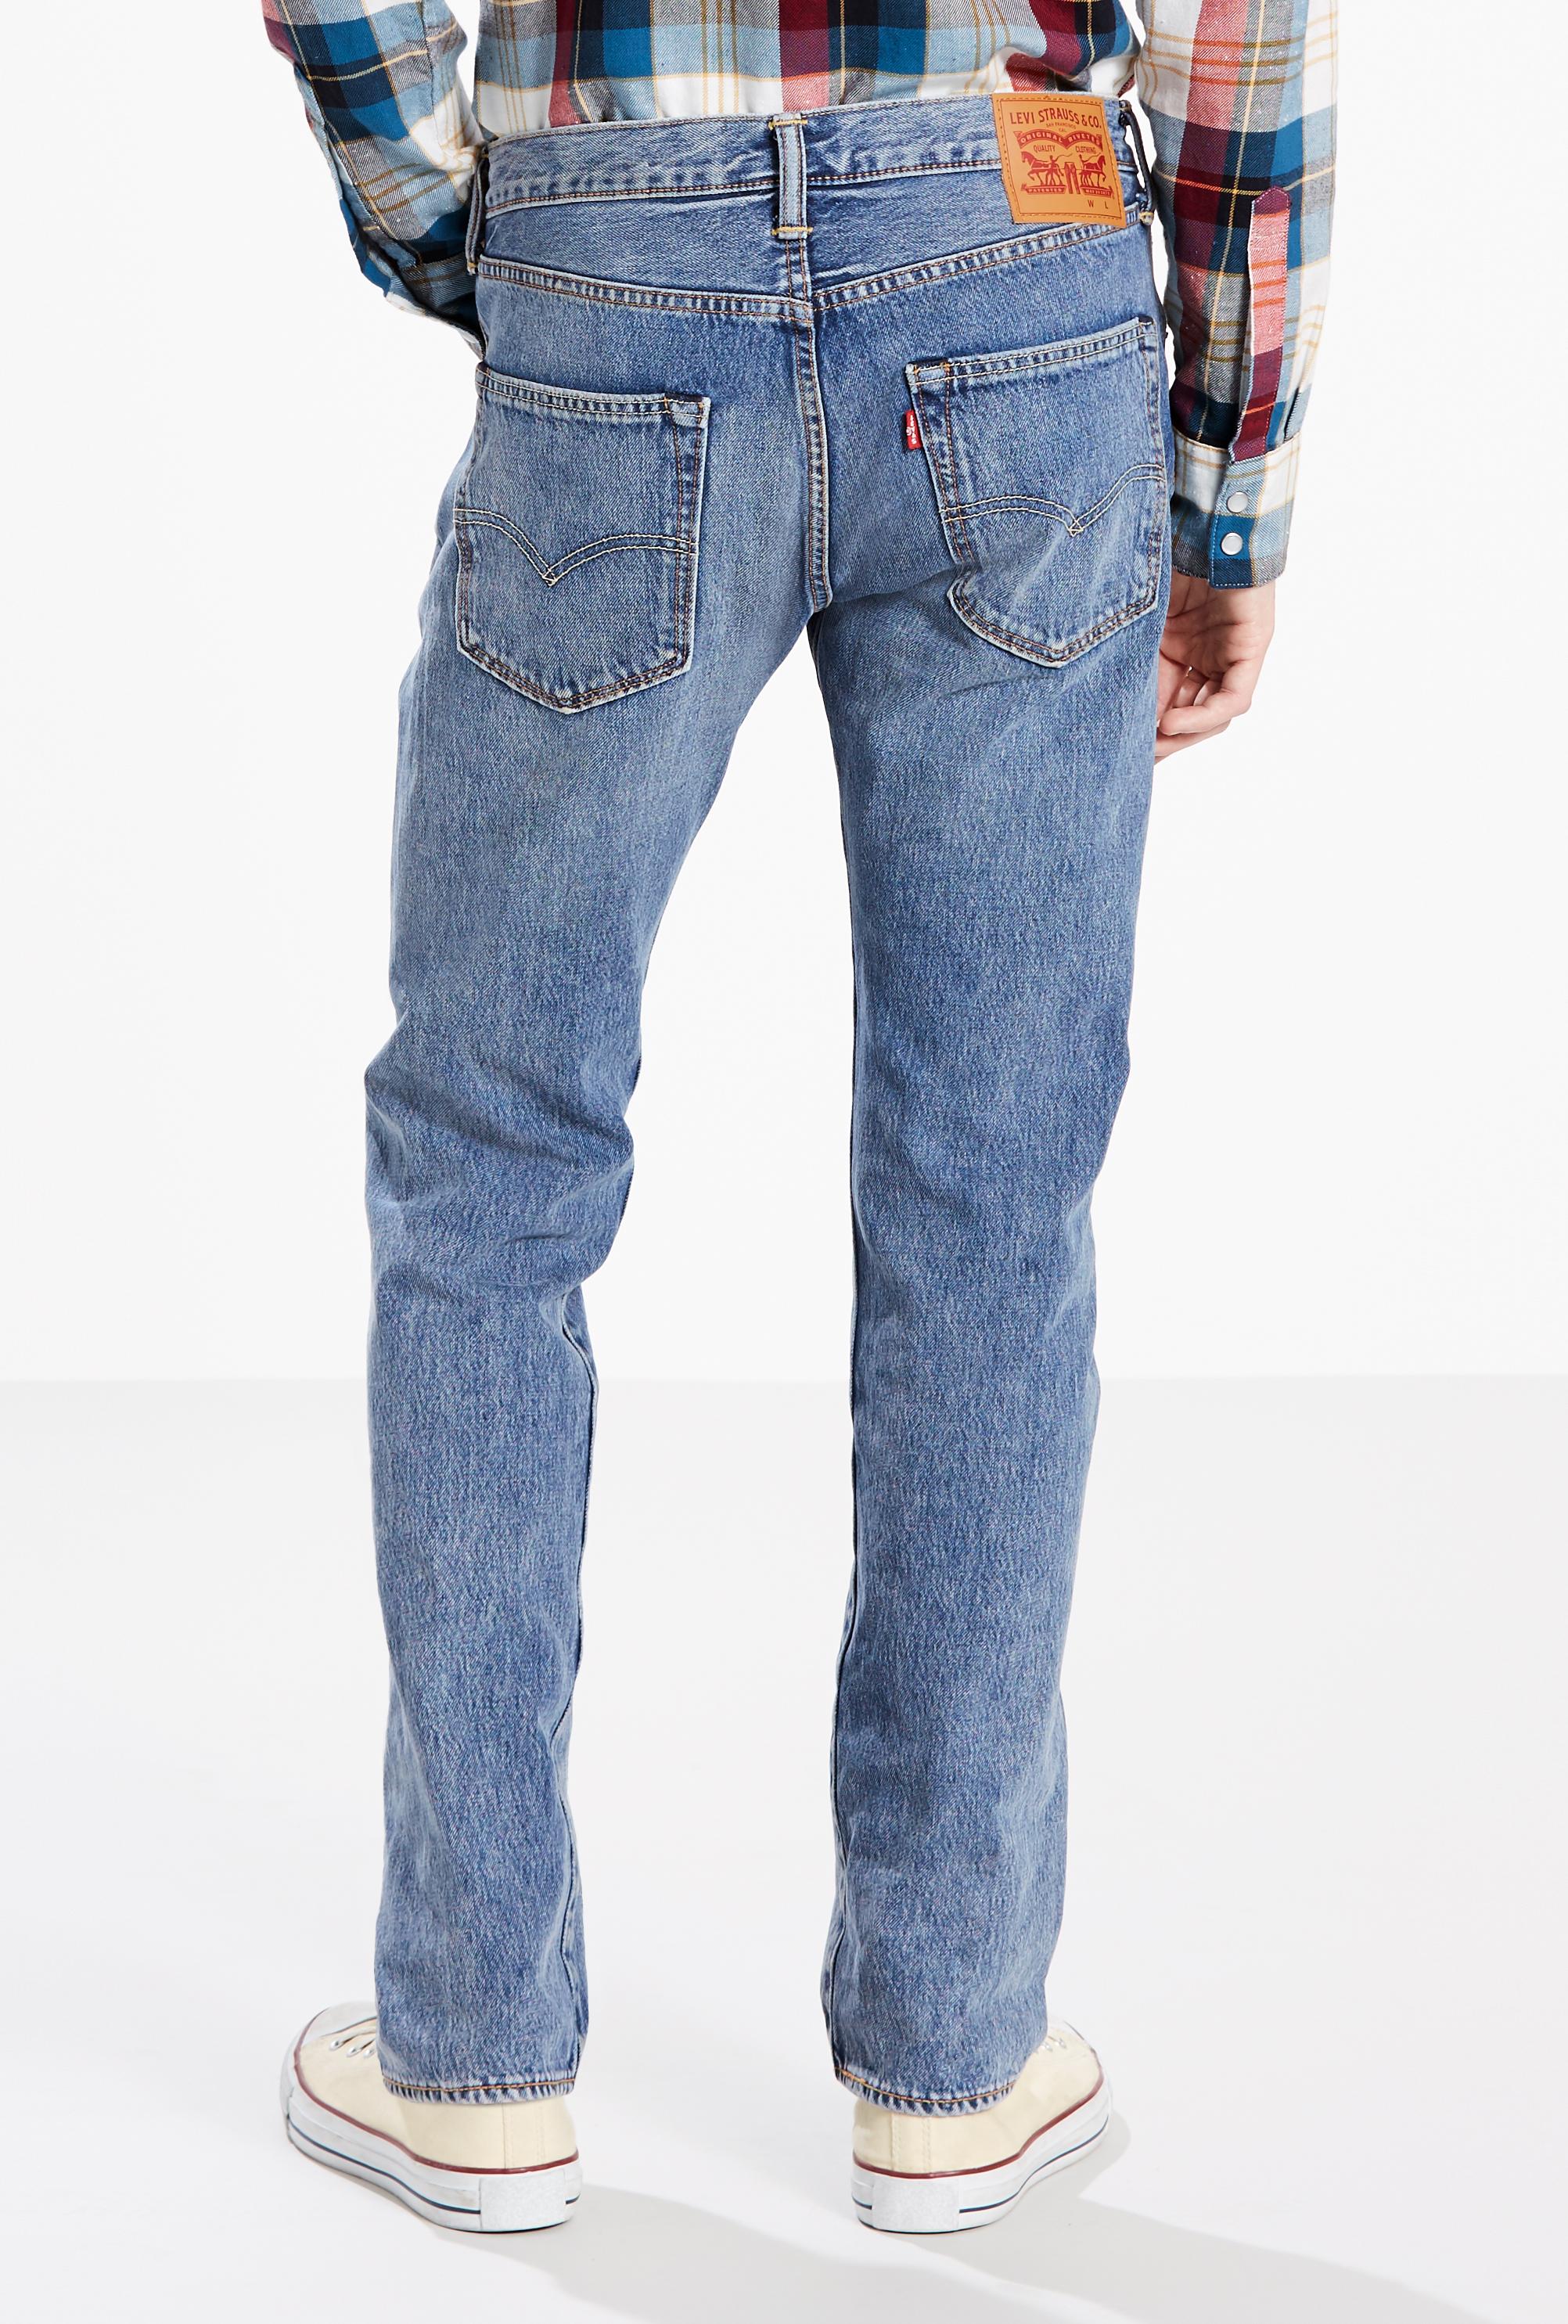 LEVIS Jeanshose Jeans 29507-0011 502 REGULAR TAPER CITYPARK W18-LJJ1